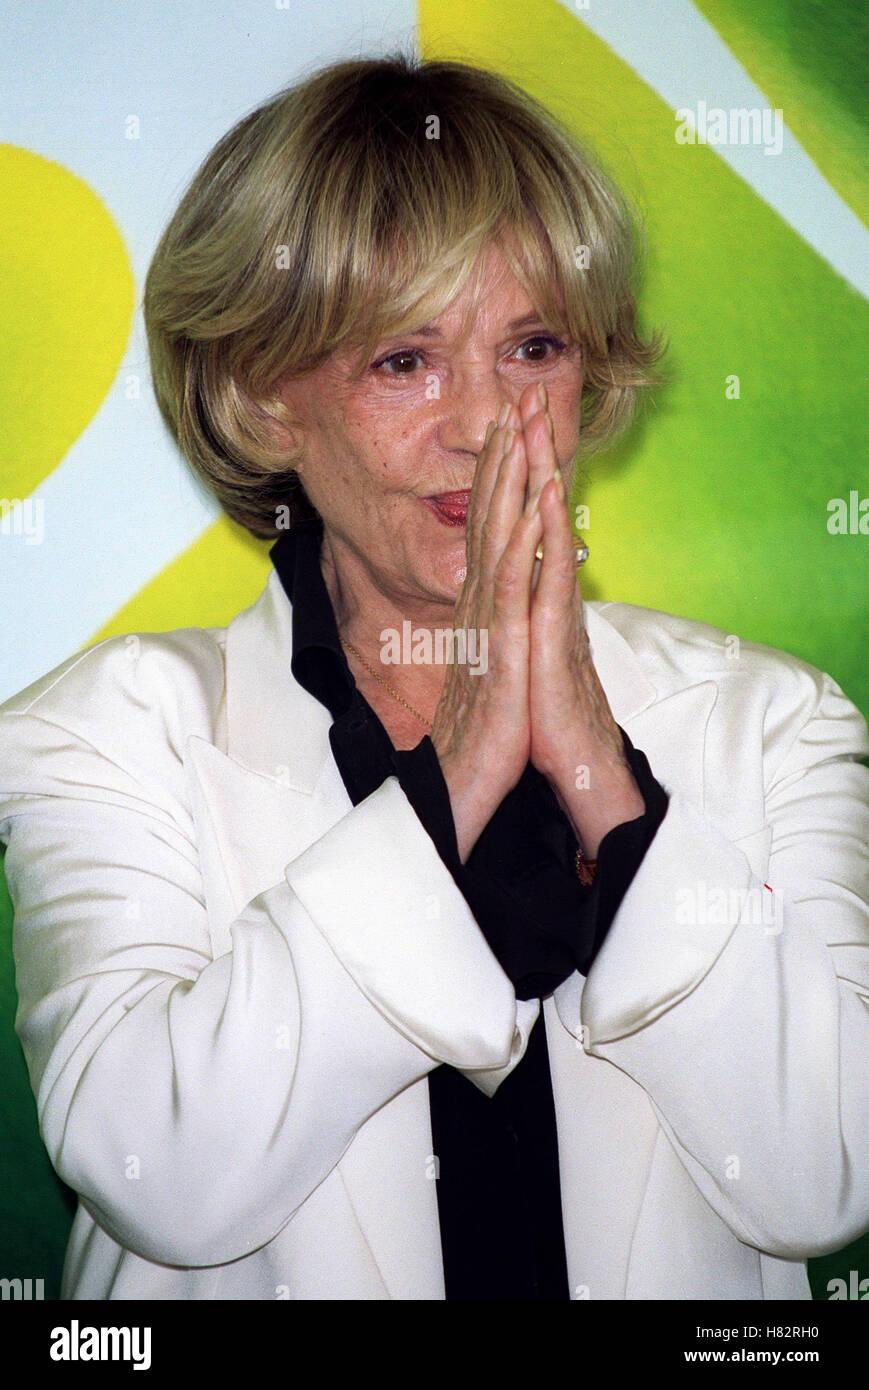 JEANNE MOREAU 'CET AMOUR-LA' PHOTOCALL VENICE FILM FESTIVAL 2001 ITALY 08 September 2001 - Stock Image